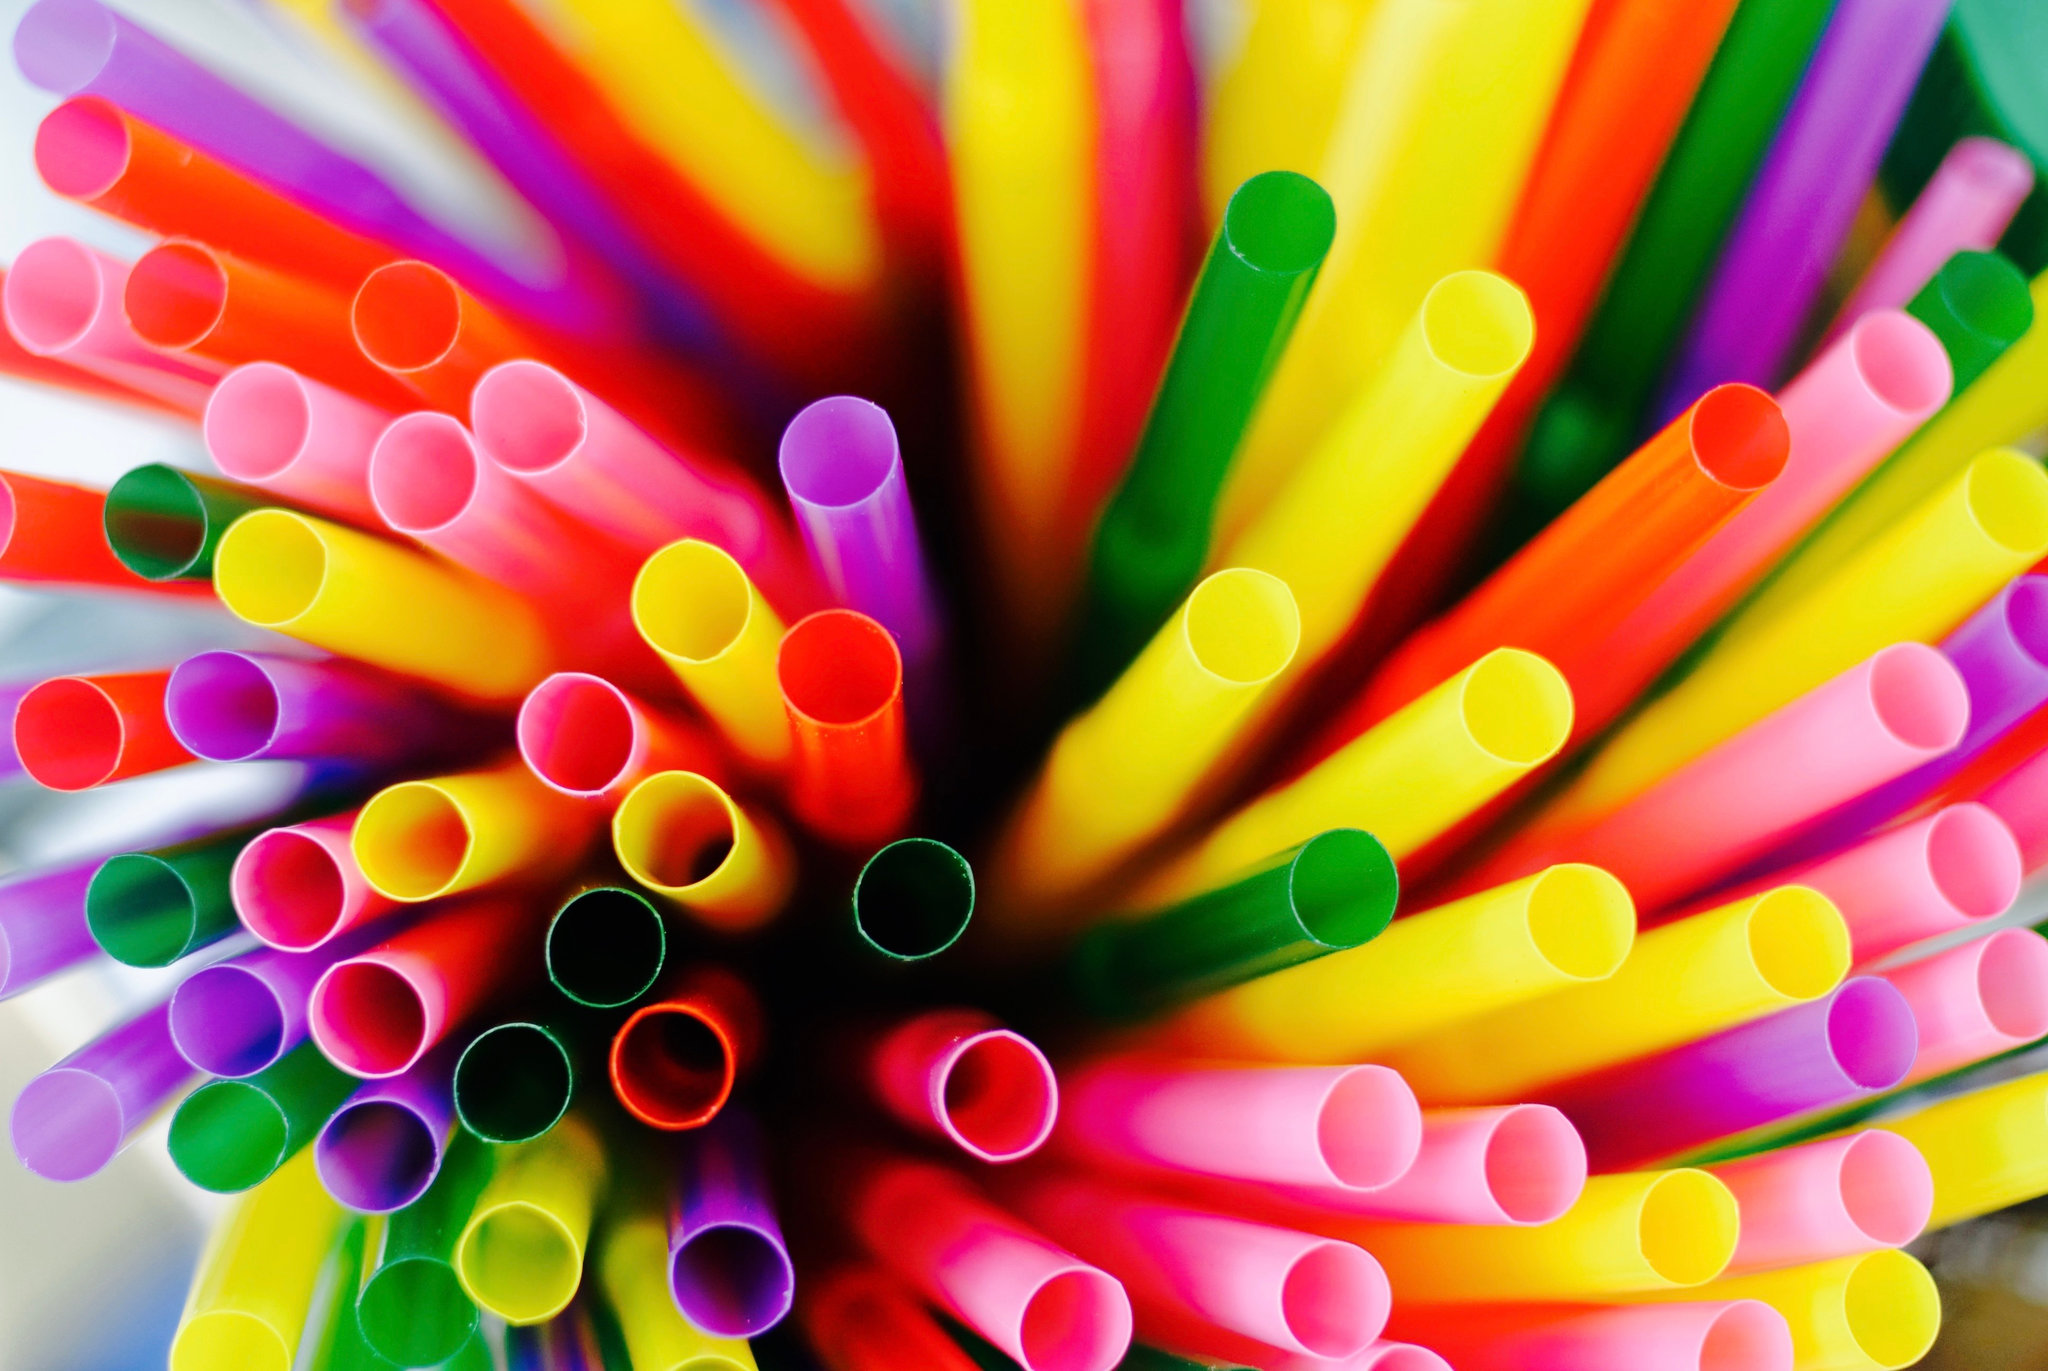 PJ's Coffee says NO to the plastic straws